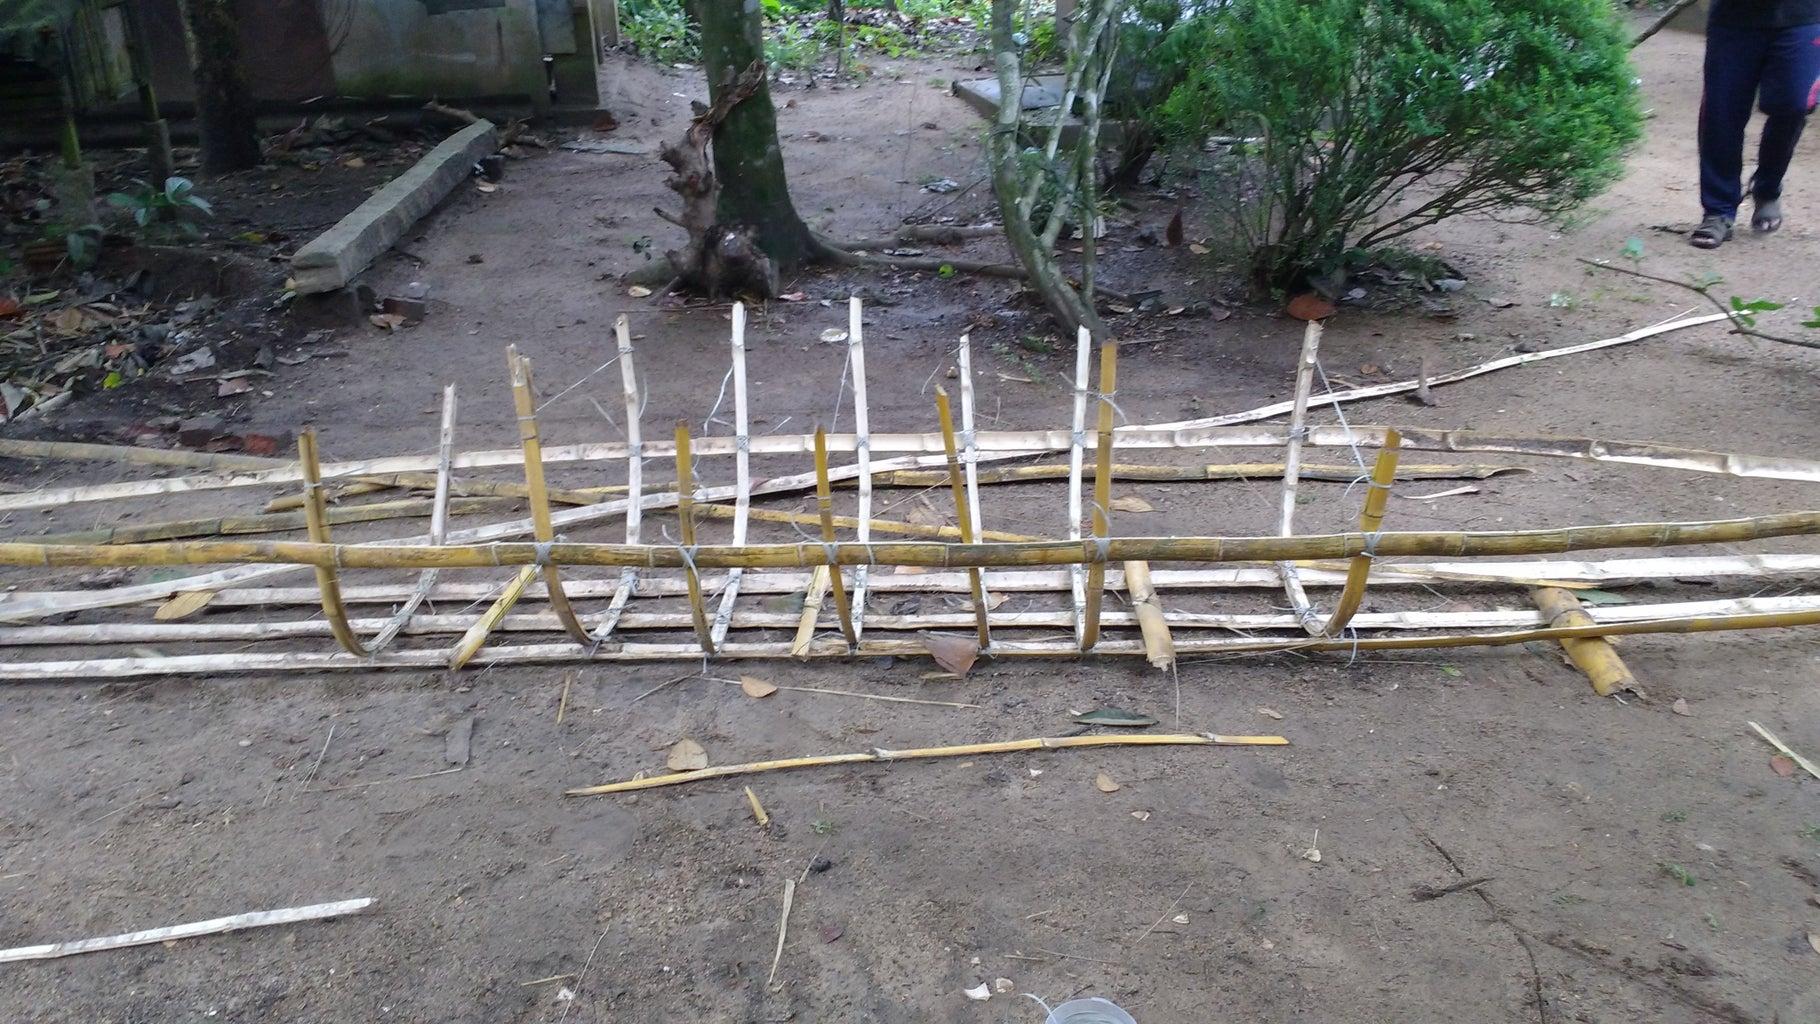 BUILDING THE FRAMEWORK